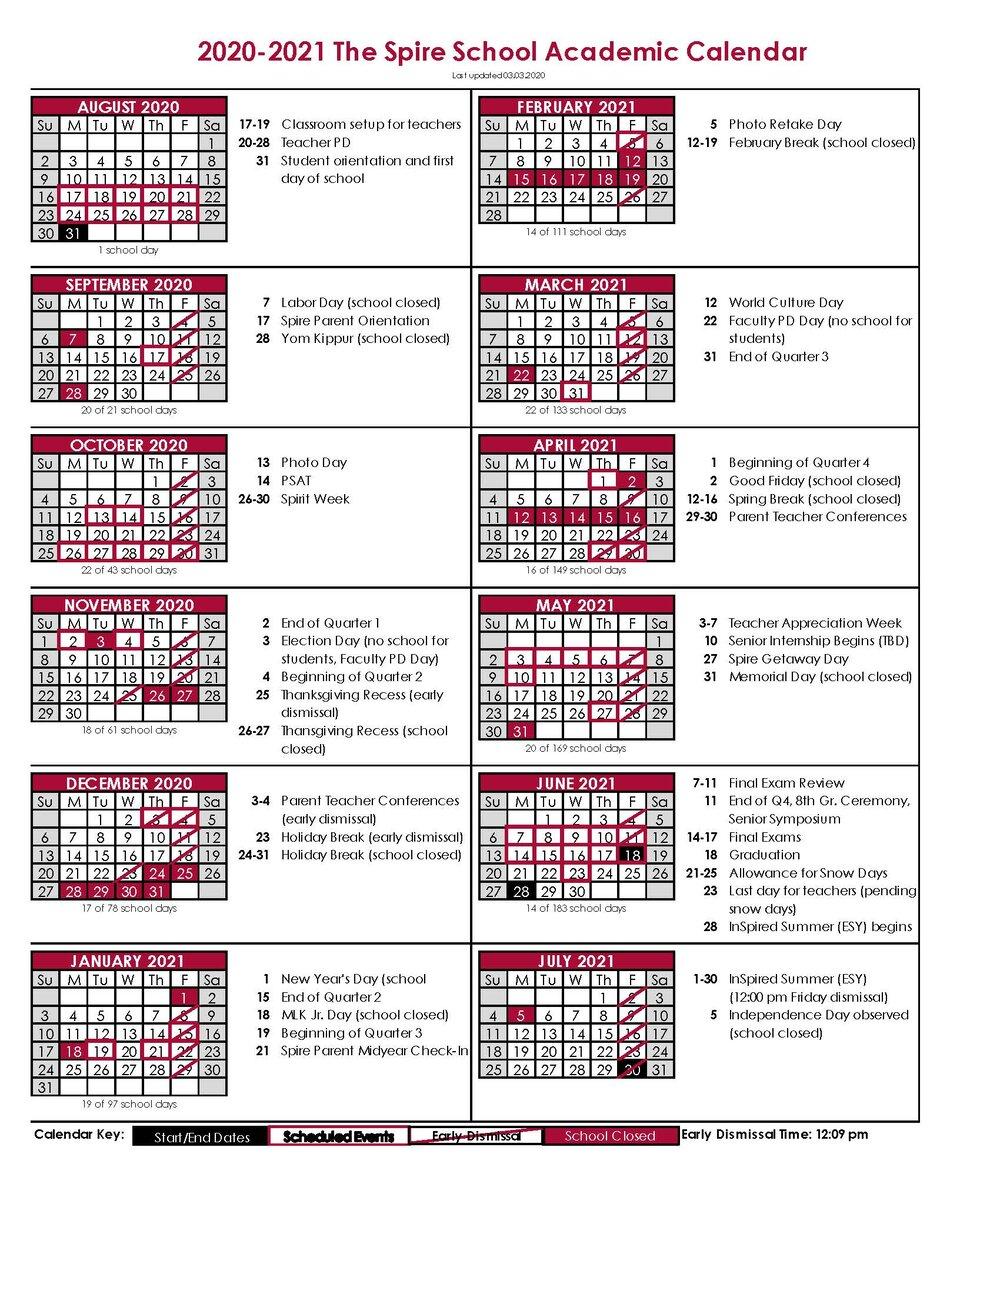 Academic Calendar — The Spire School Regarding College Of Staten Island Spring 2021 Calendar